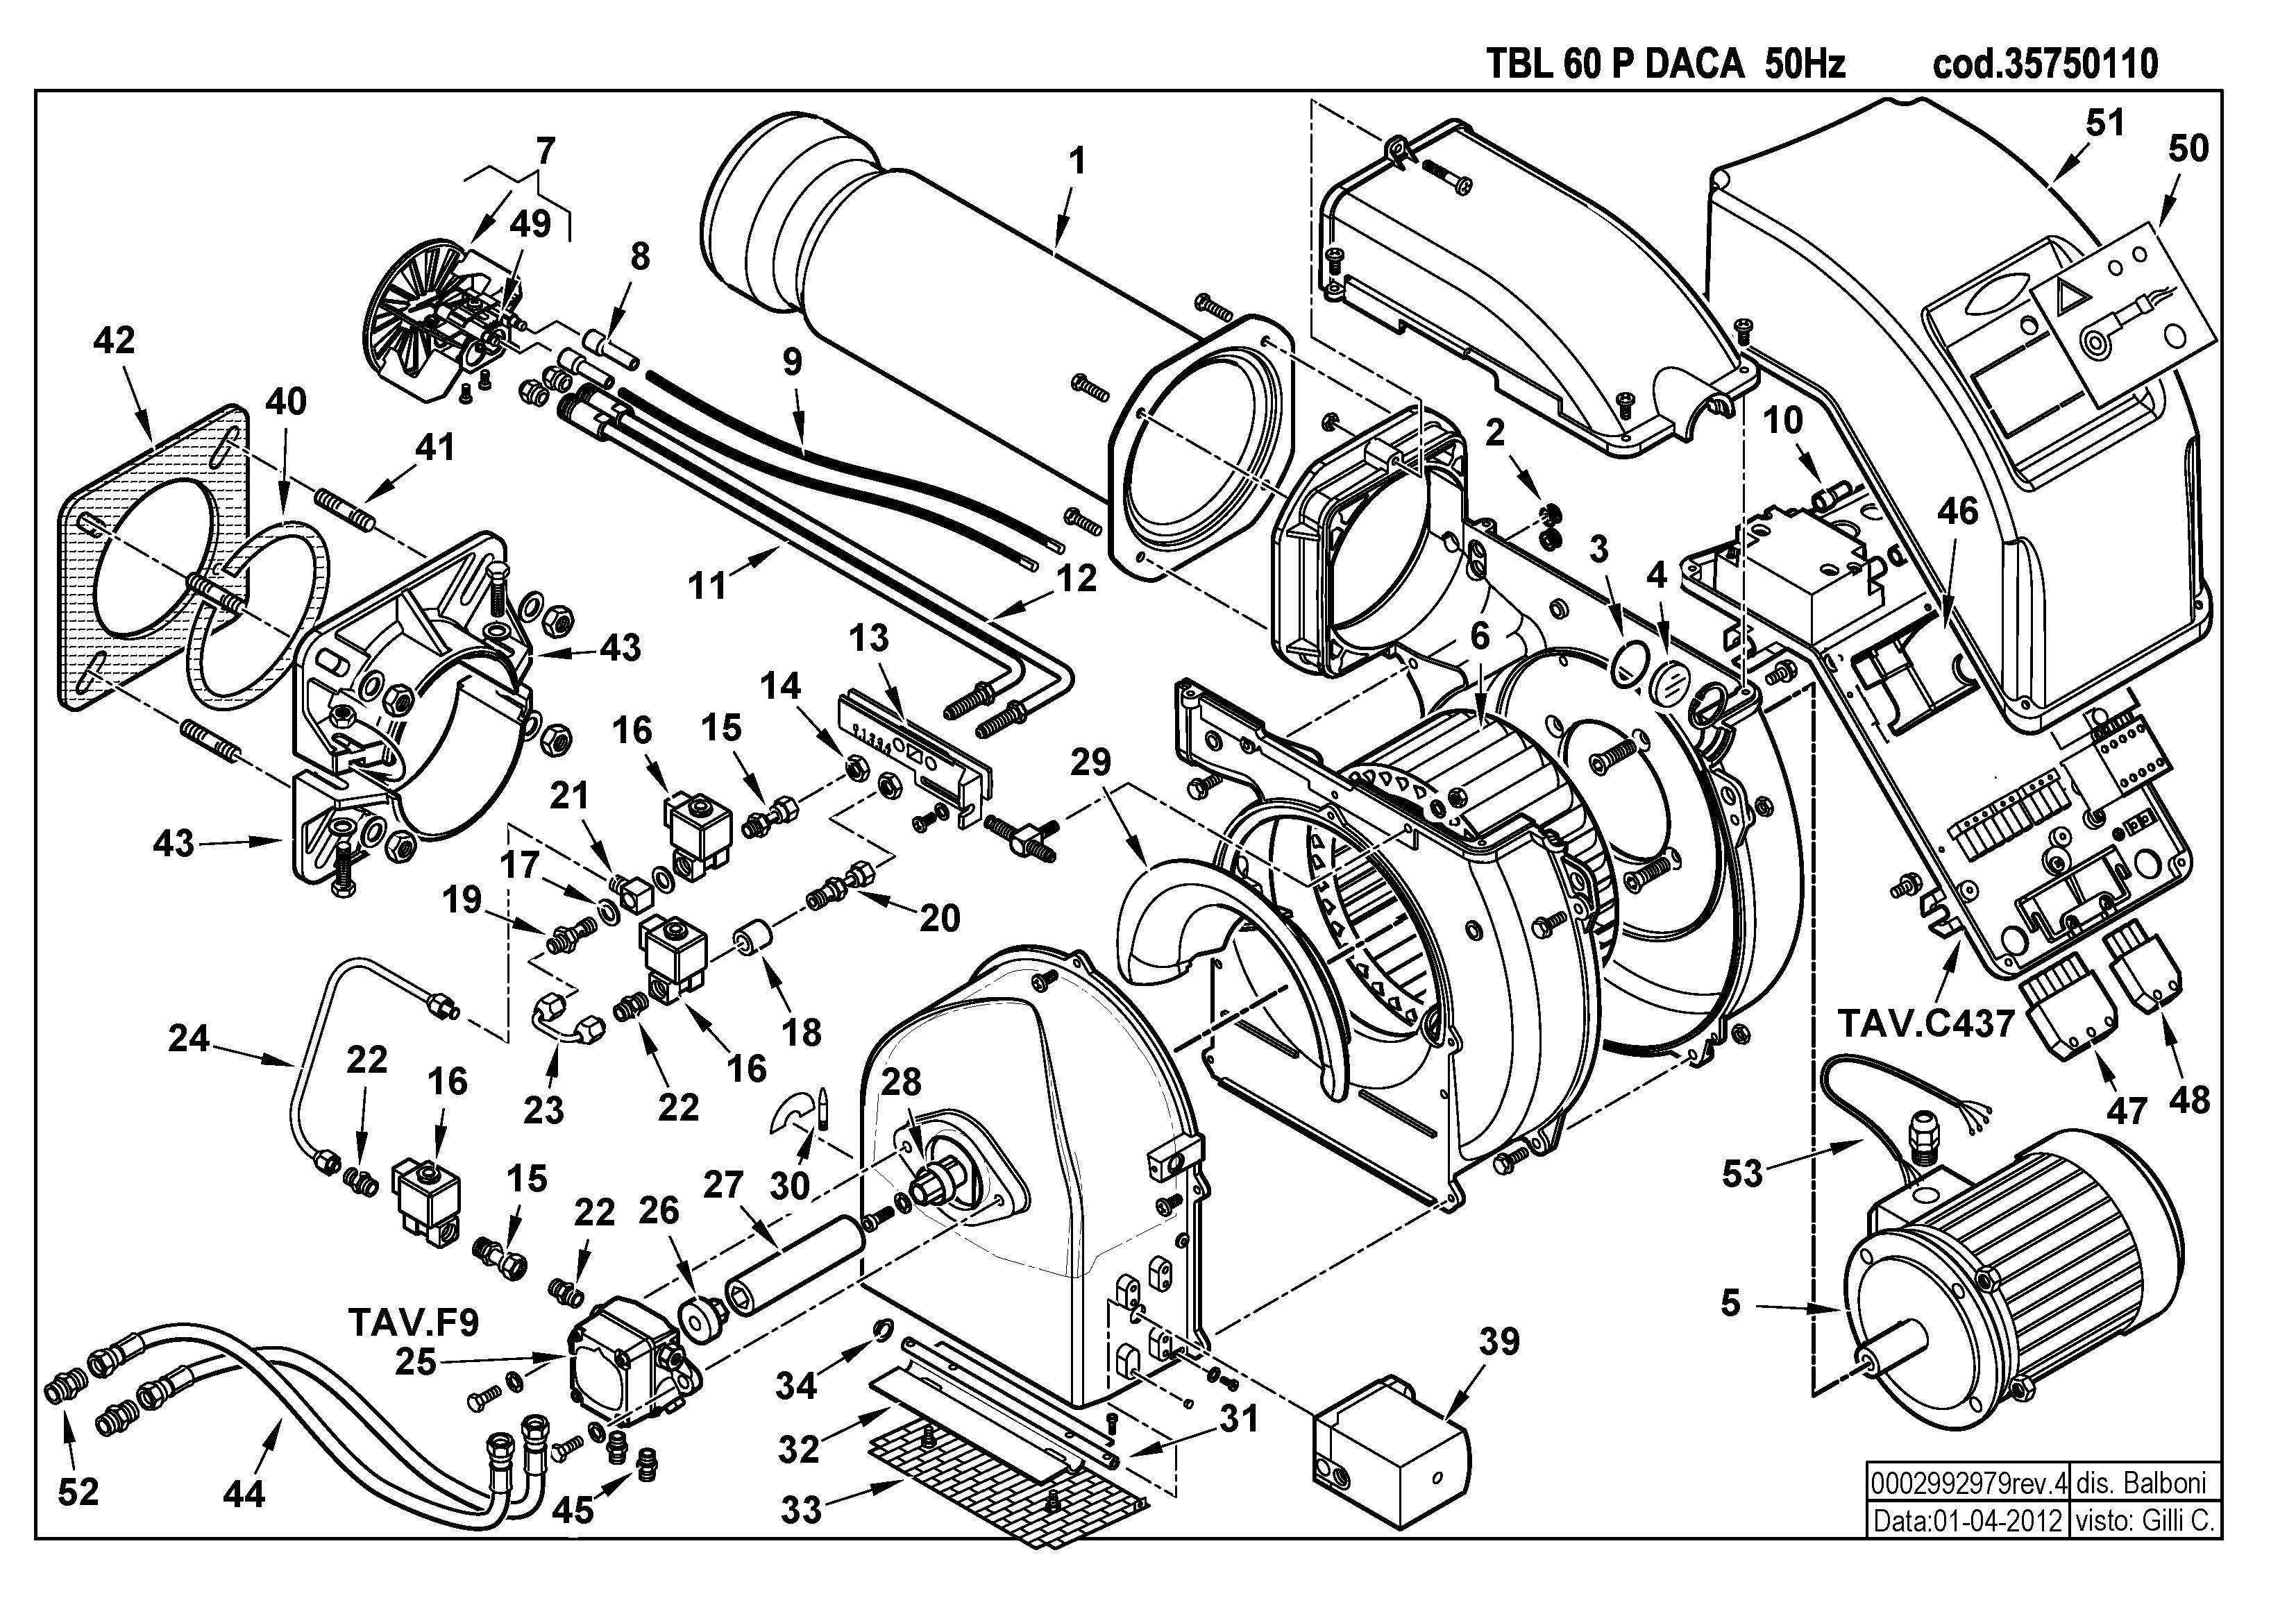 TBL 60 P DACA 35750110 4 20120401